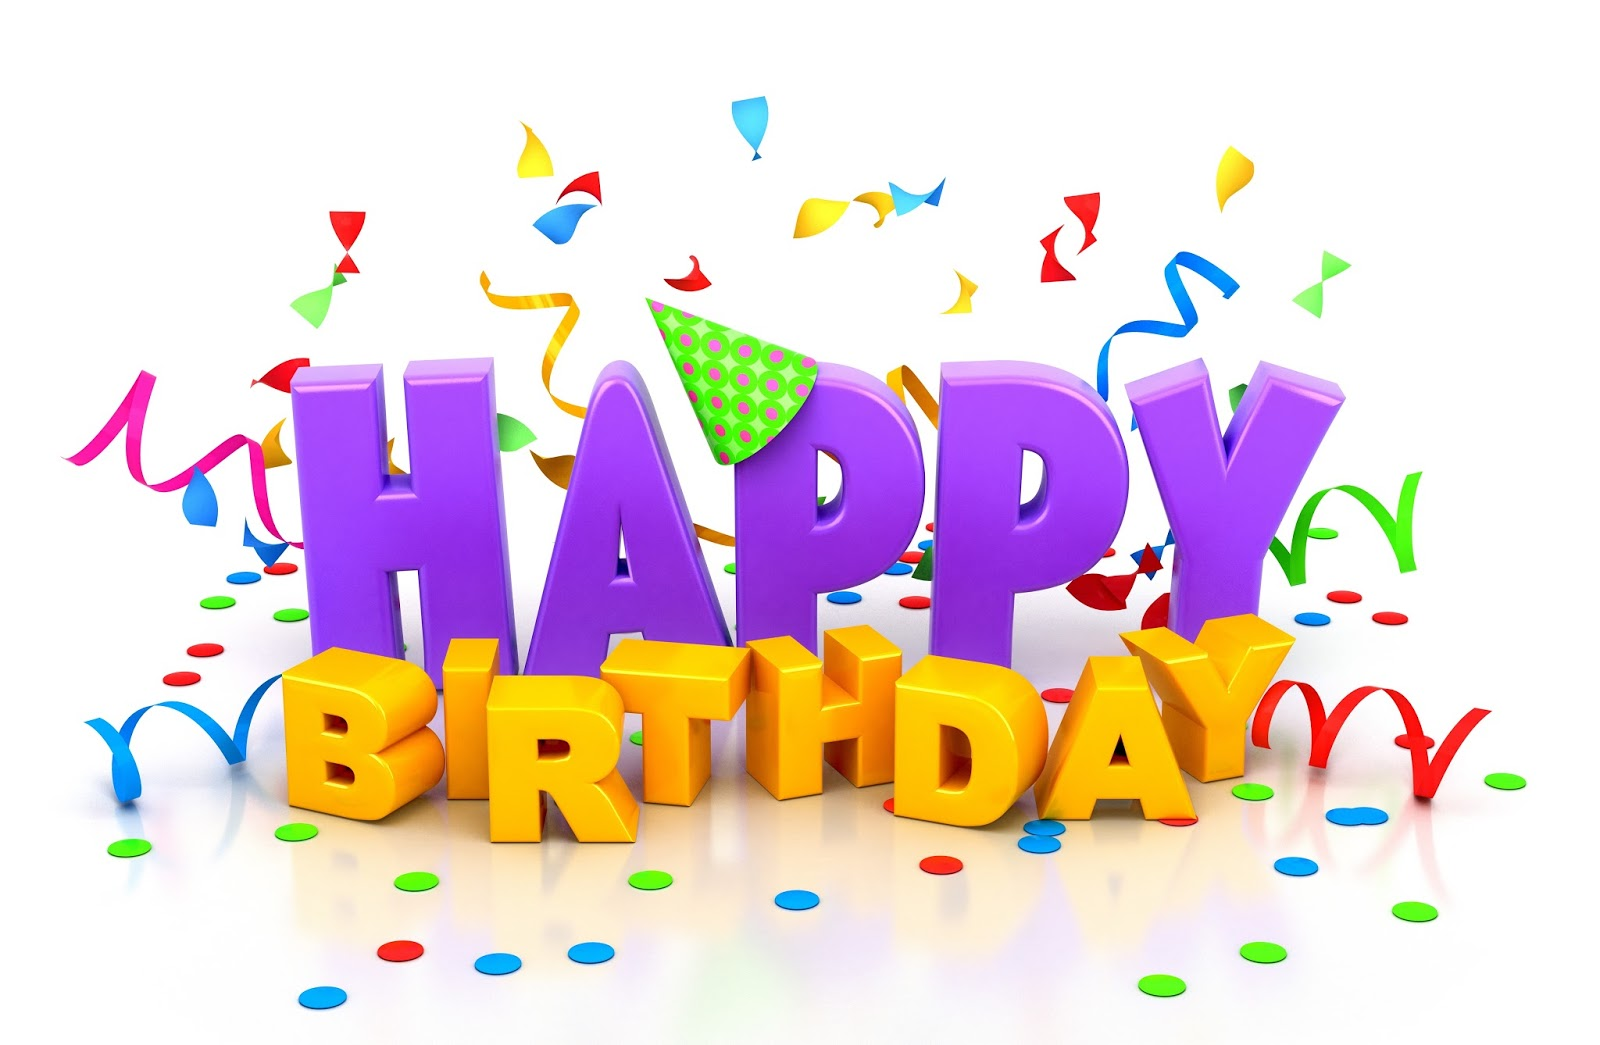 birthday logos rh logolynx com birthday logo pictures birthday logos for ladies